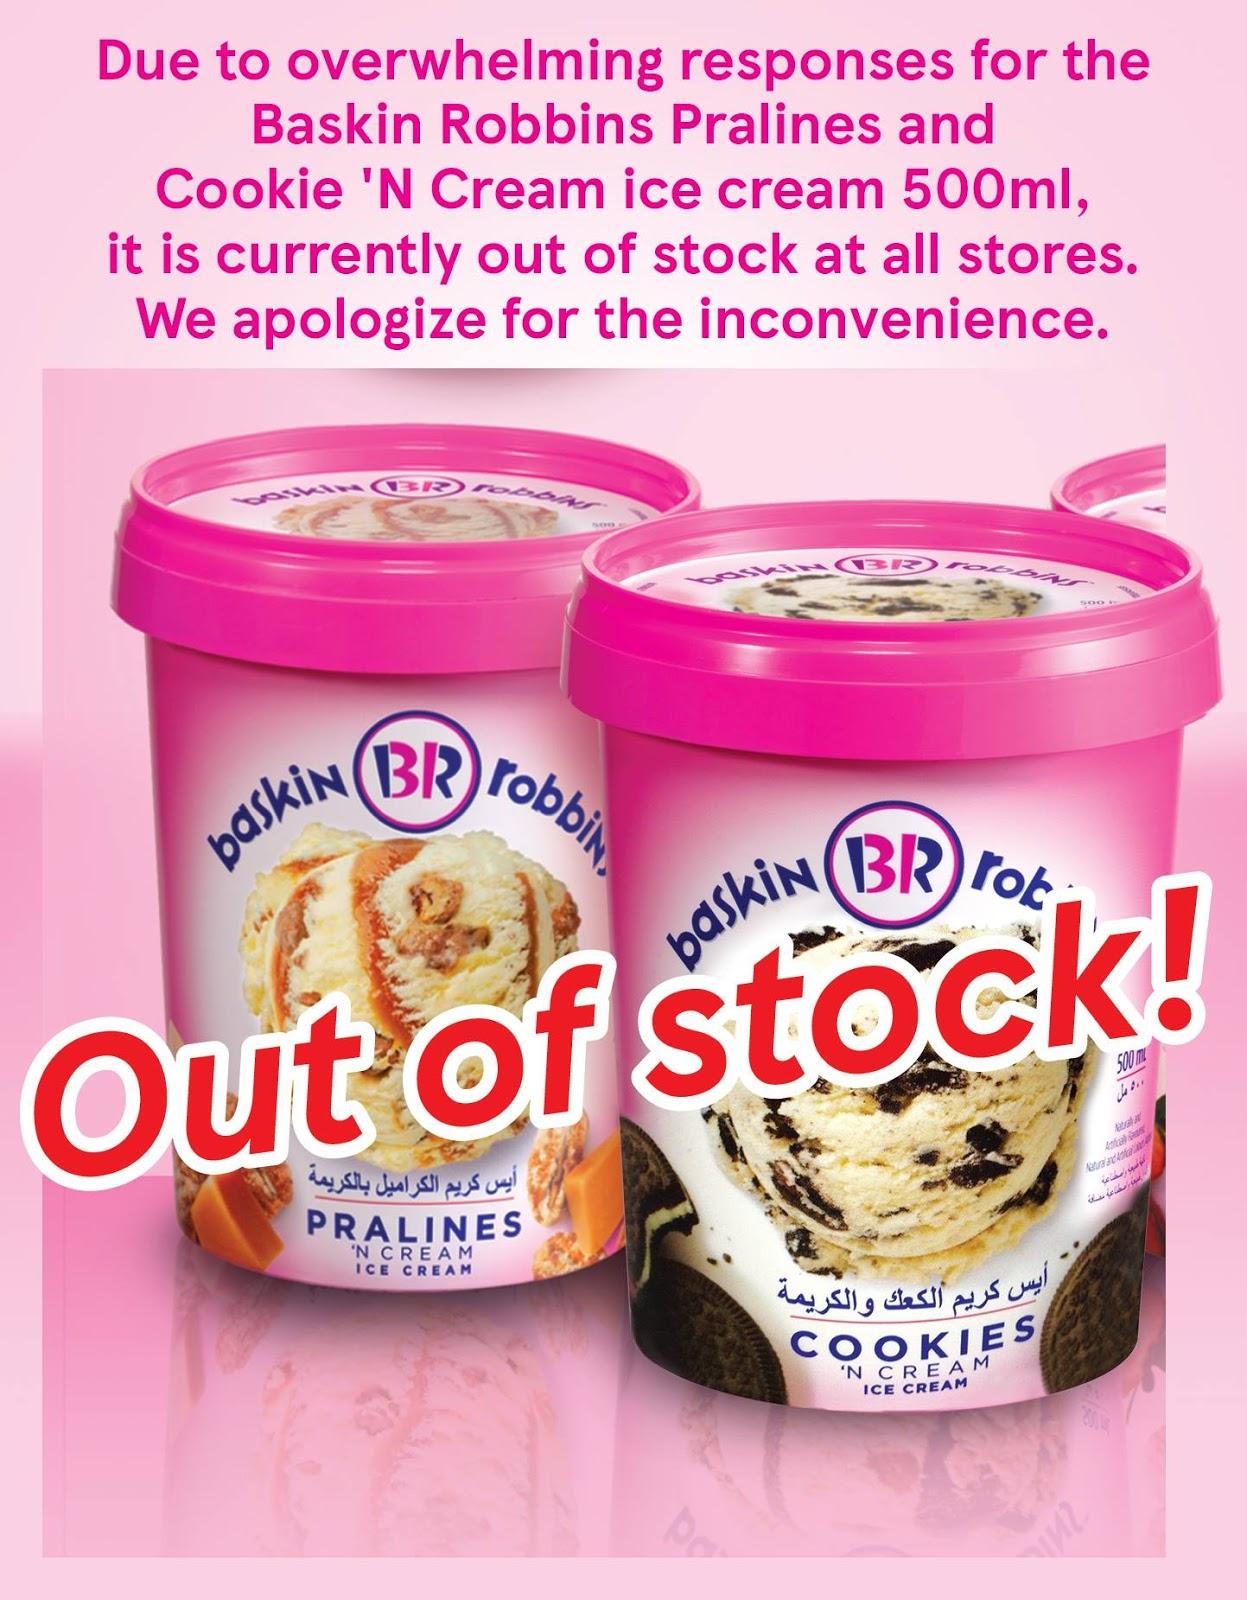 Baskin Robbins Cookies / Pralines 'N Cream Ice Cream 500ml ...